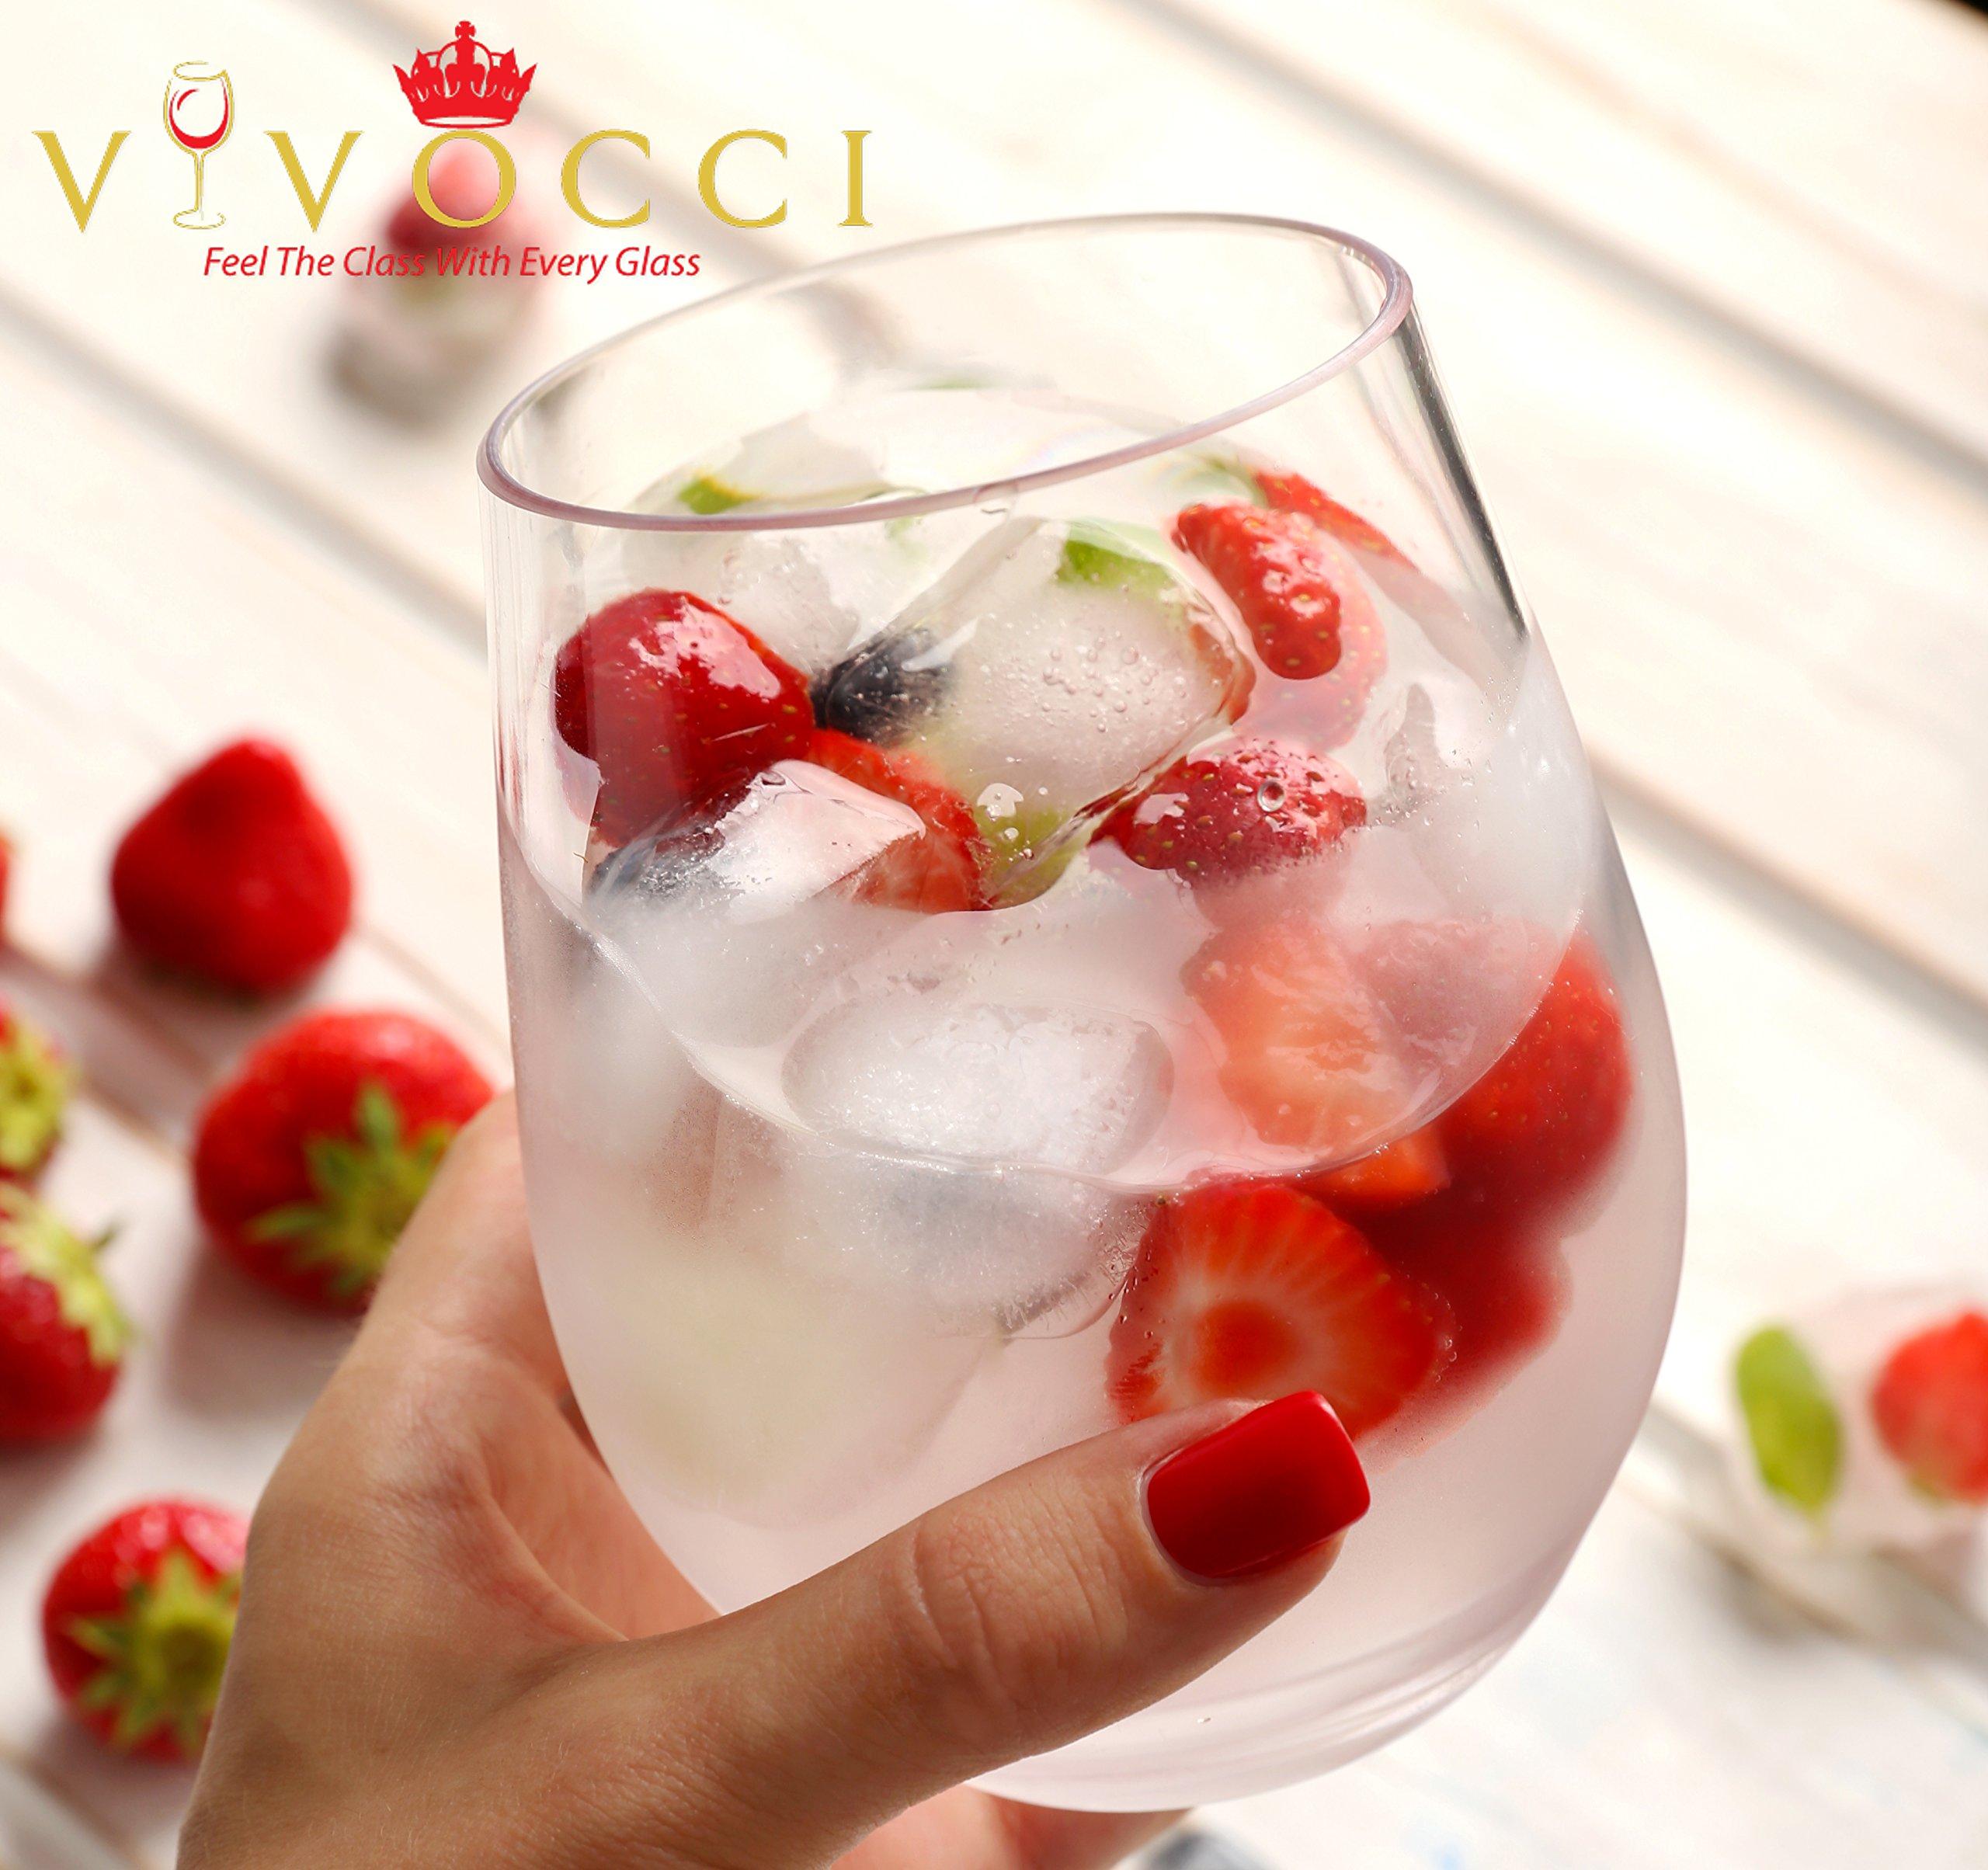 Vivocci Unbreakable Elegant Plastic Stemless Wine Glasses 20 oz | 100% Tritan Heavy Base | Shatterproof Glassware | Ideal For Cocktails & Scotch | Perfect For Homes & Bars | Dishwasher Safe | Set of 2 by Vivocci (Image #3)